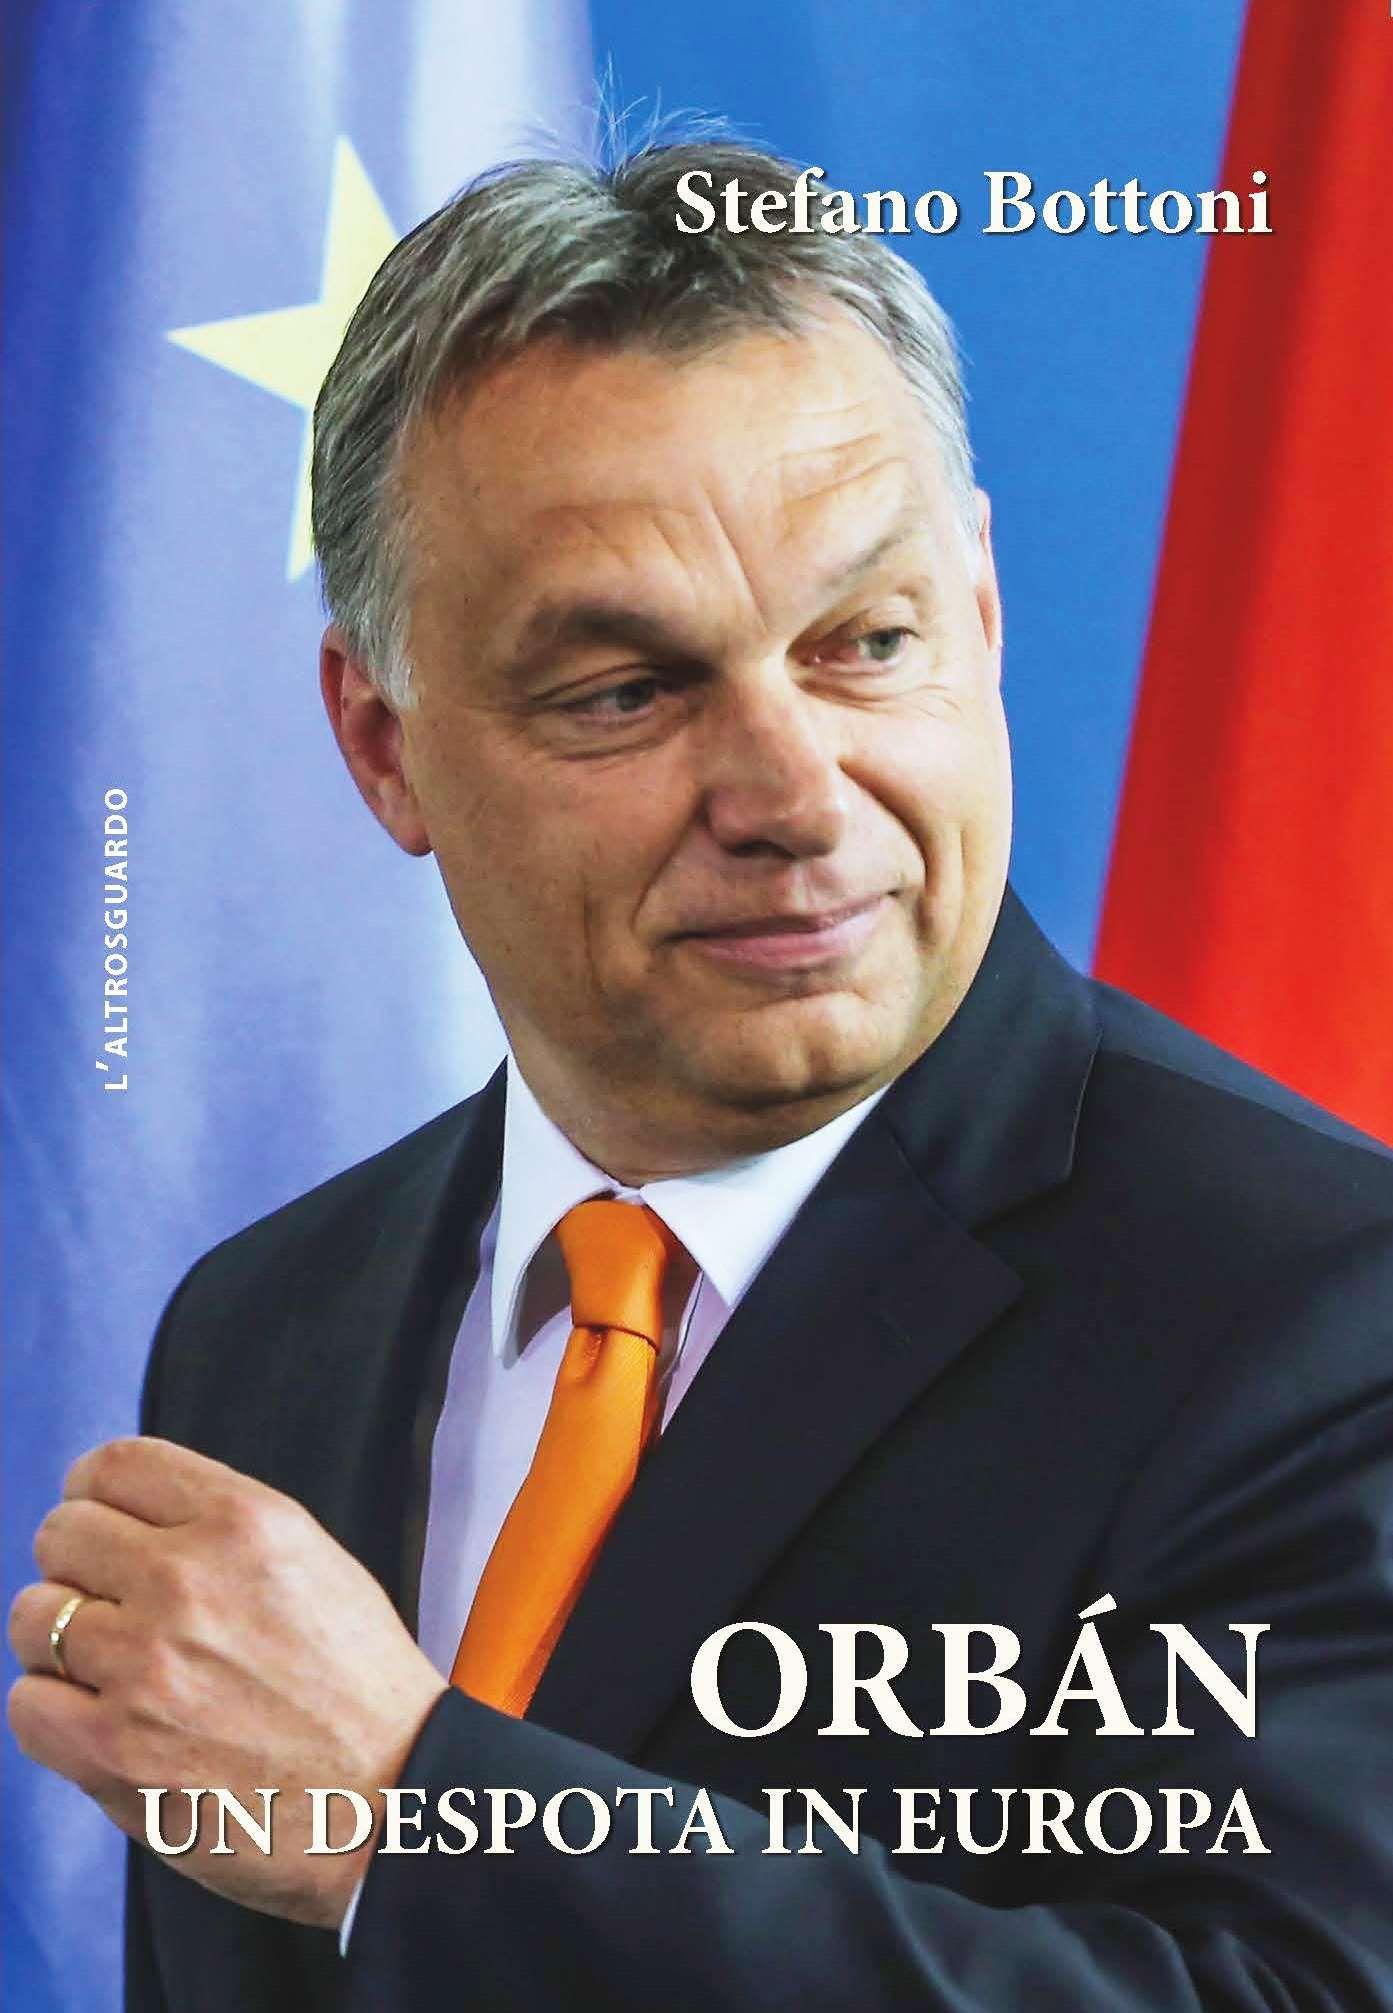 Orban copertina Bottoni